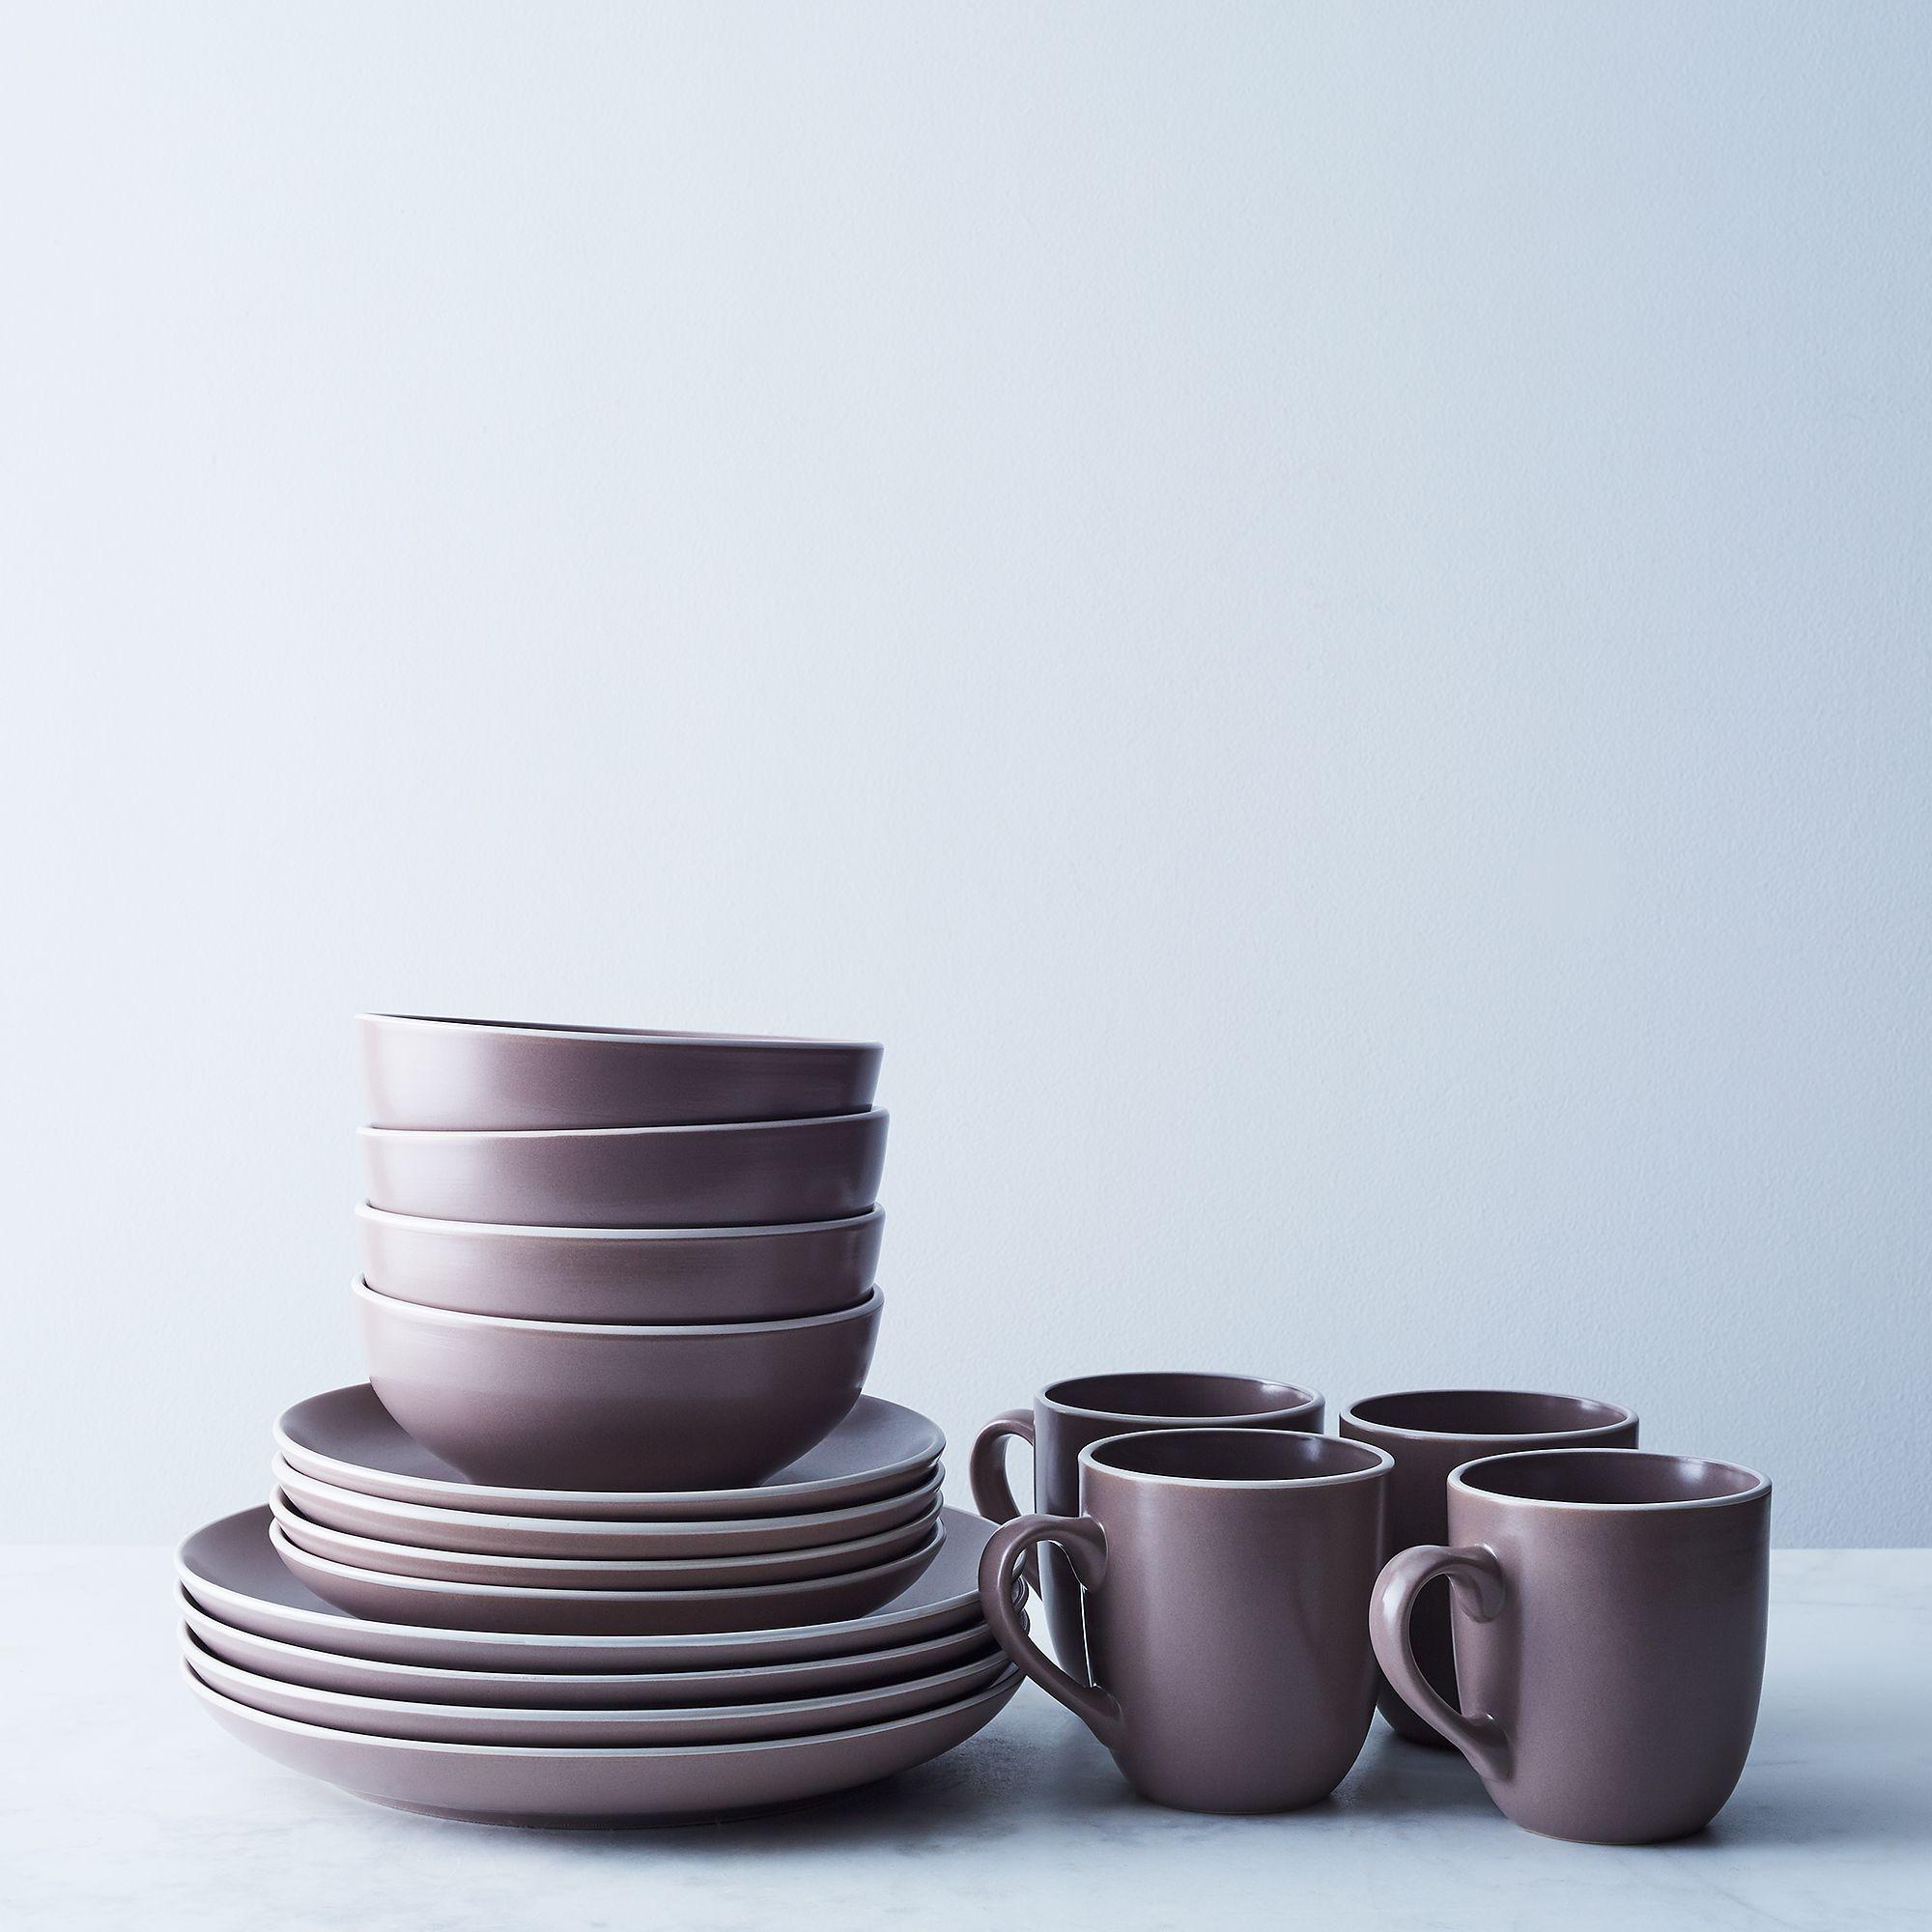 Dd91110c aaa8 4254 88fa 6e840bb02aff  2017 0821 dansk kisco dinnerware 16 piece set taupe silo julia gartland 206